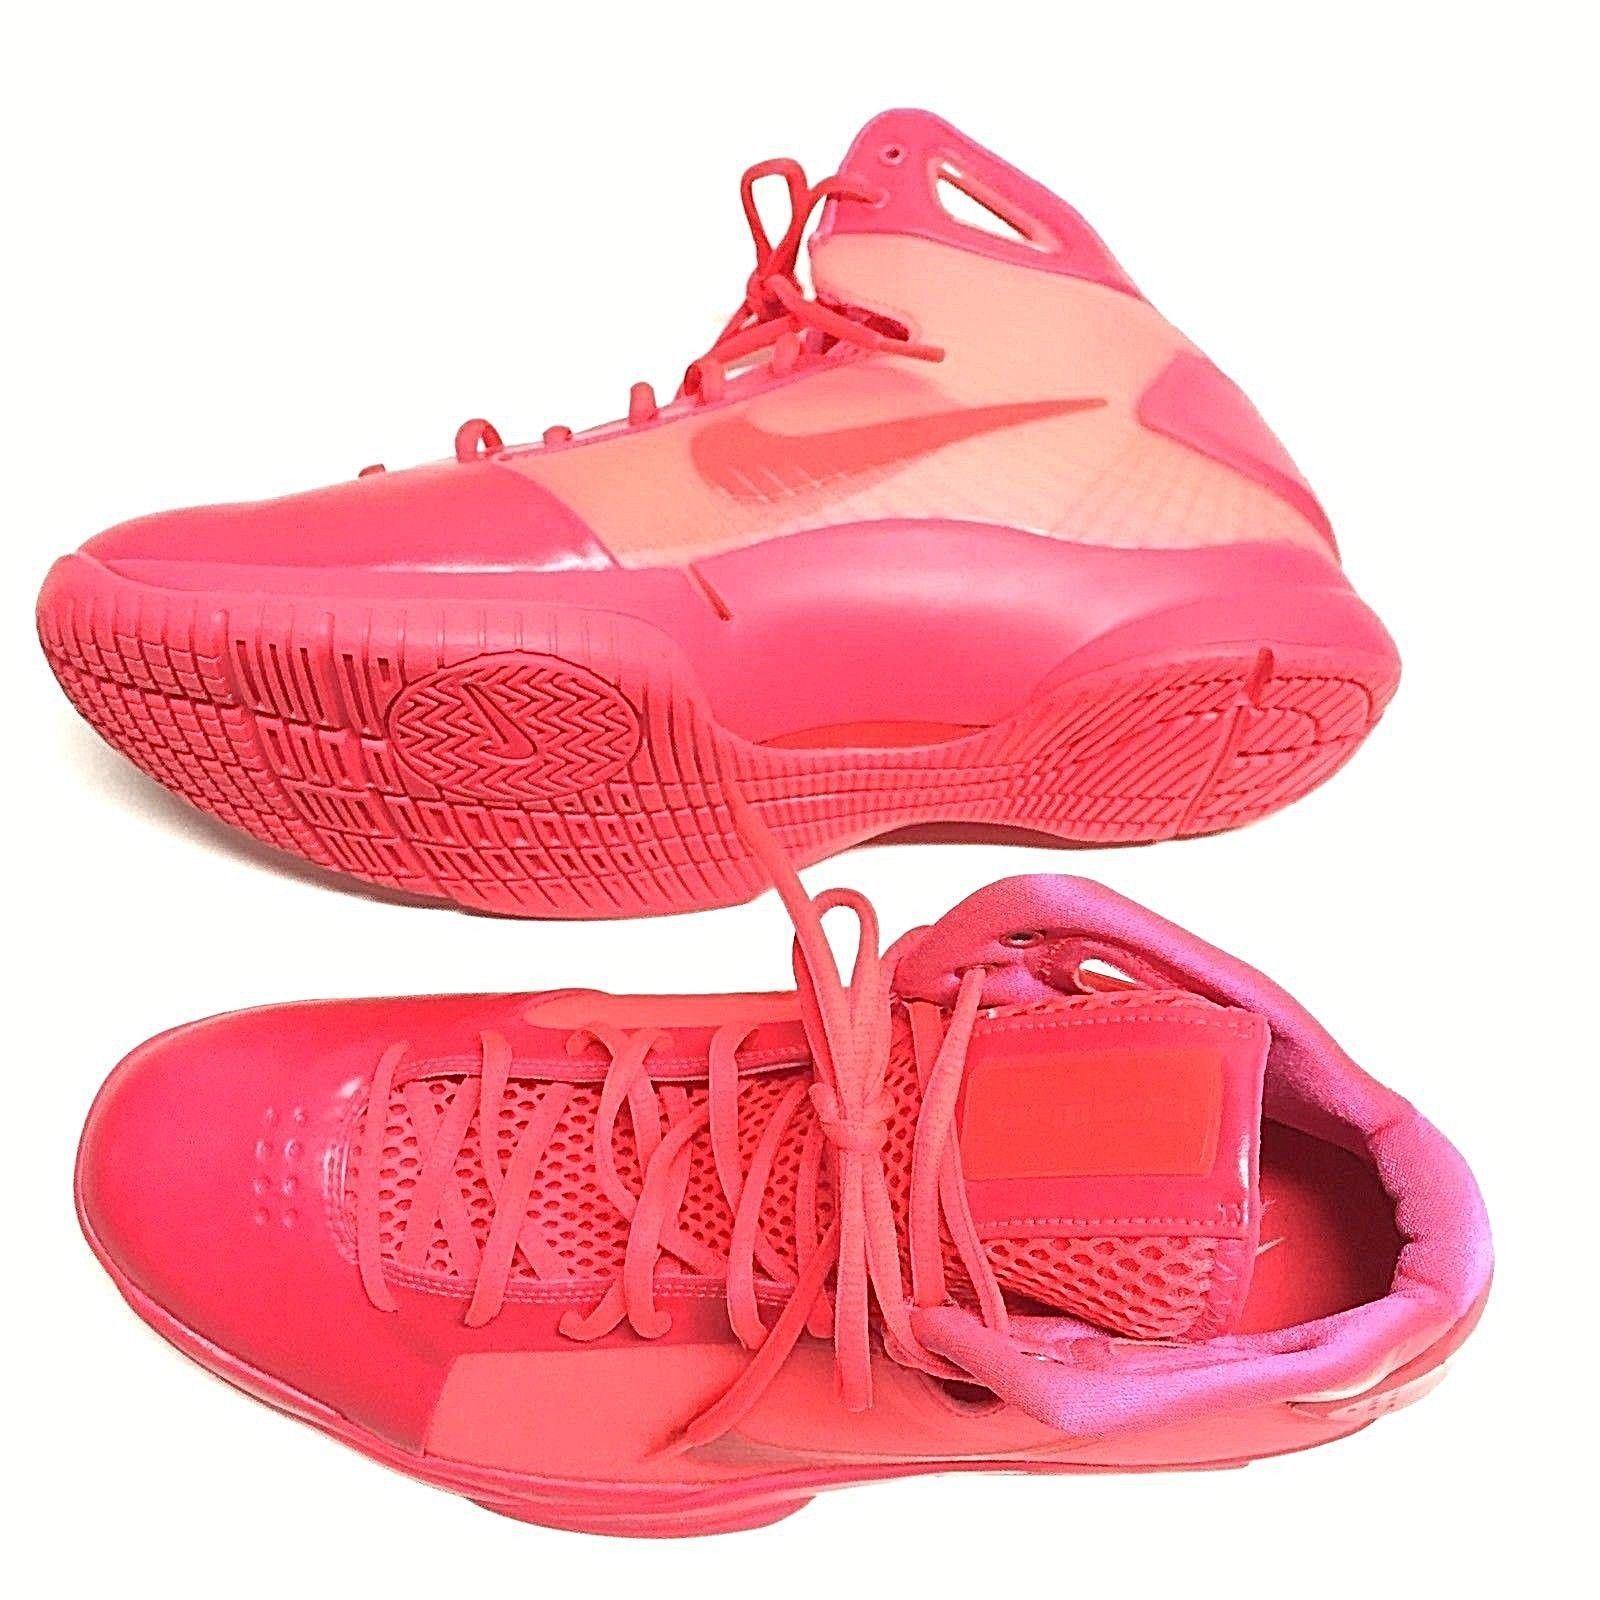 Nike Men Hyperdunk 08 Retro basketball 2016 Sz 13 solar red 820321-600